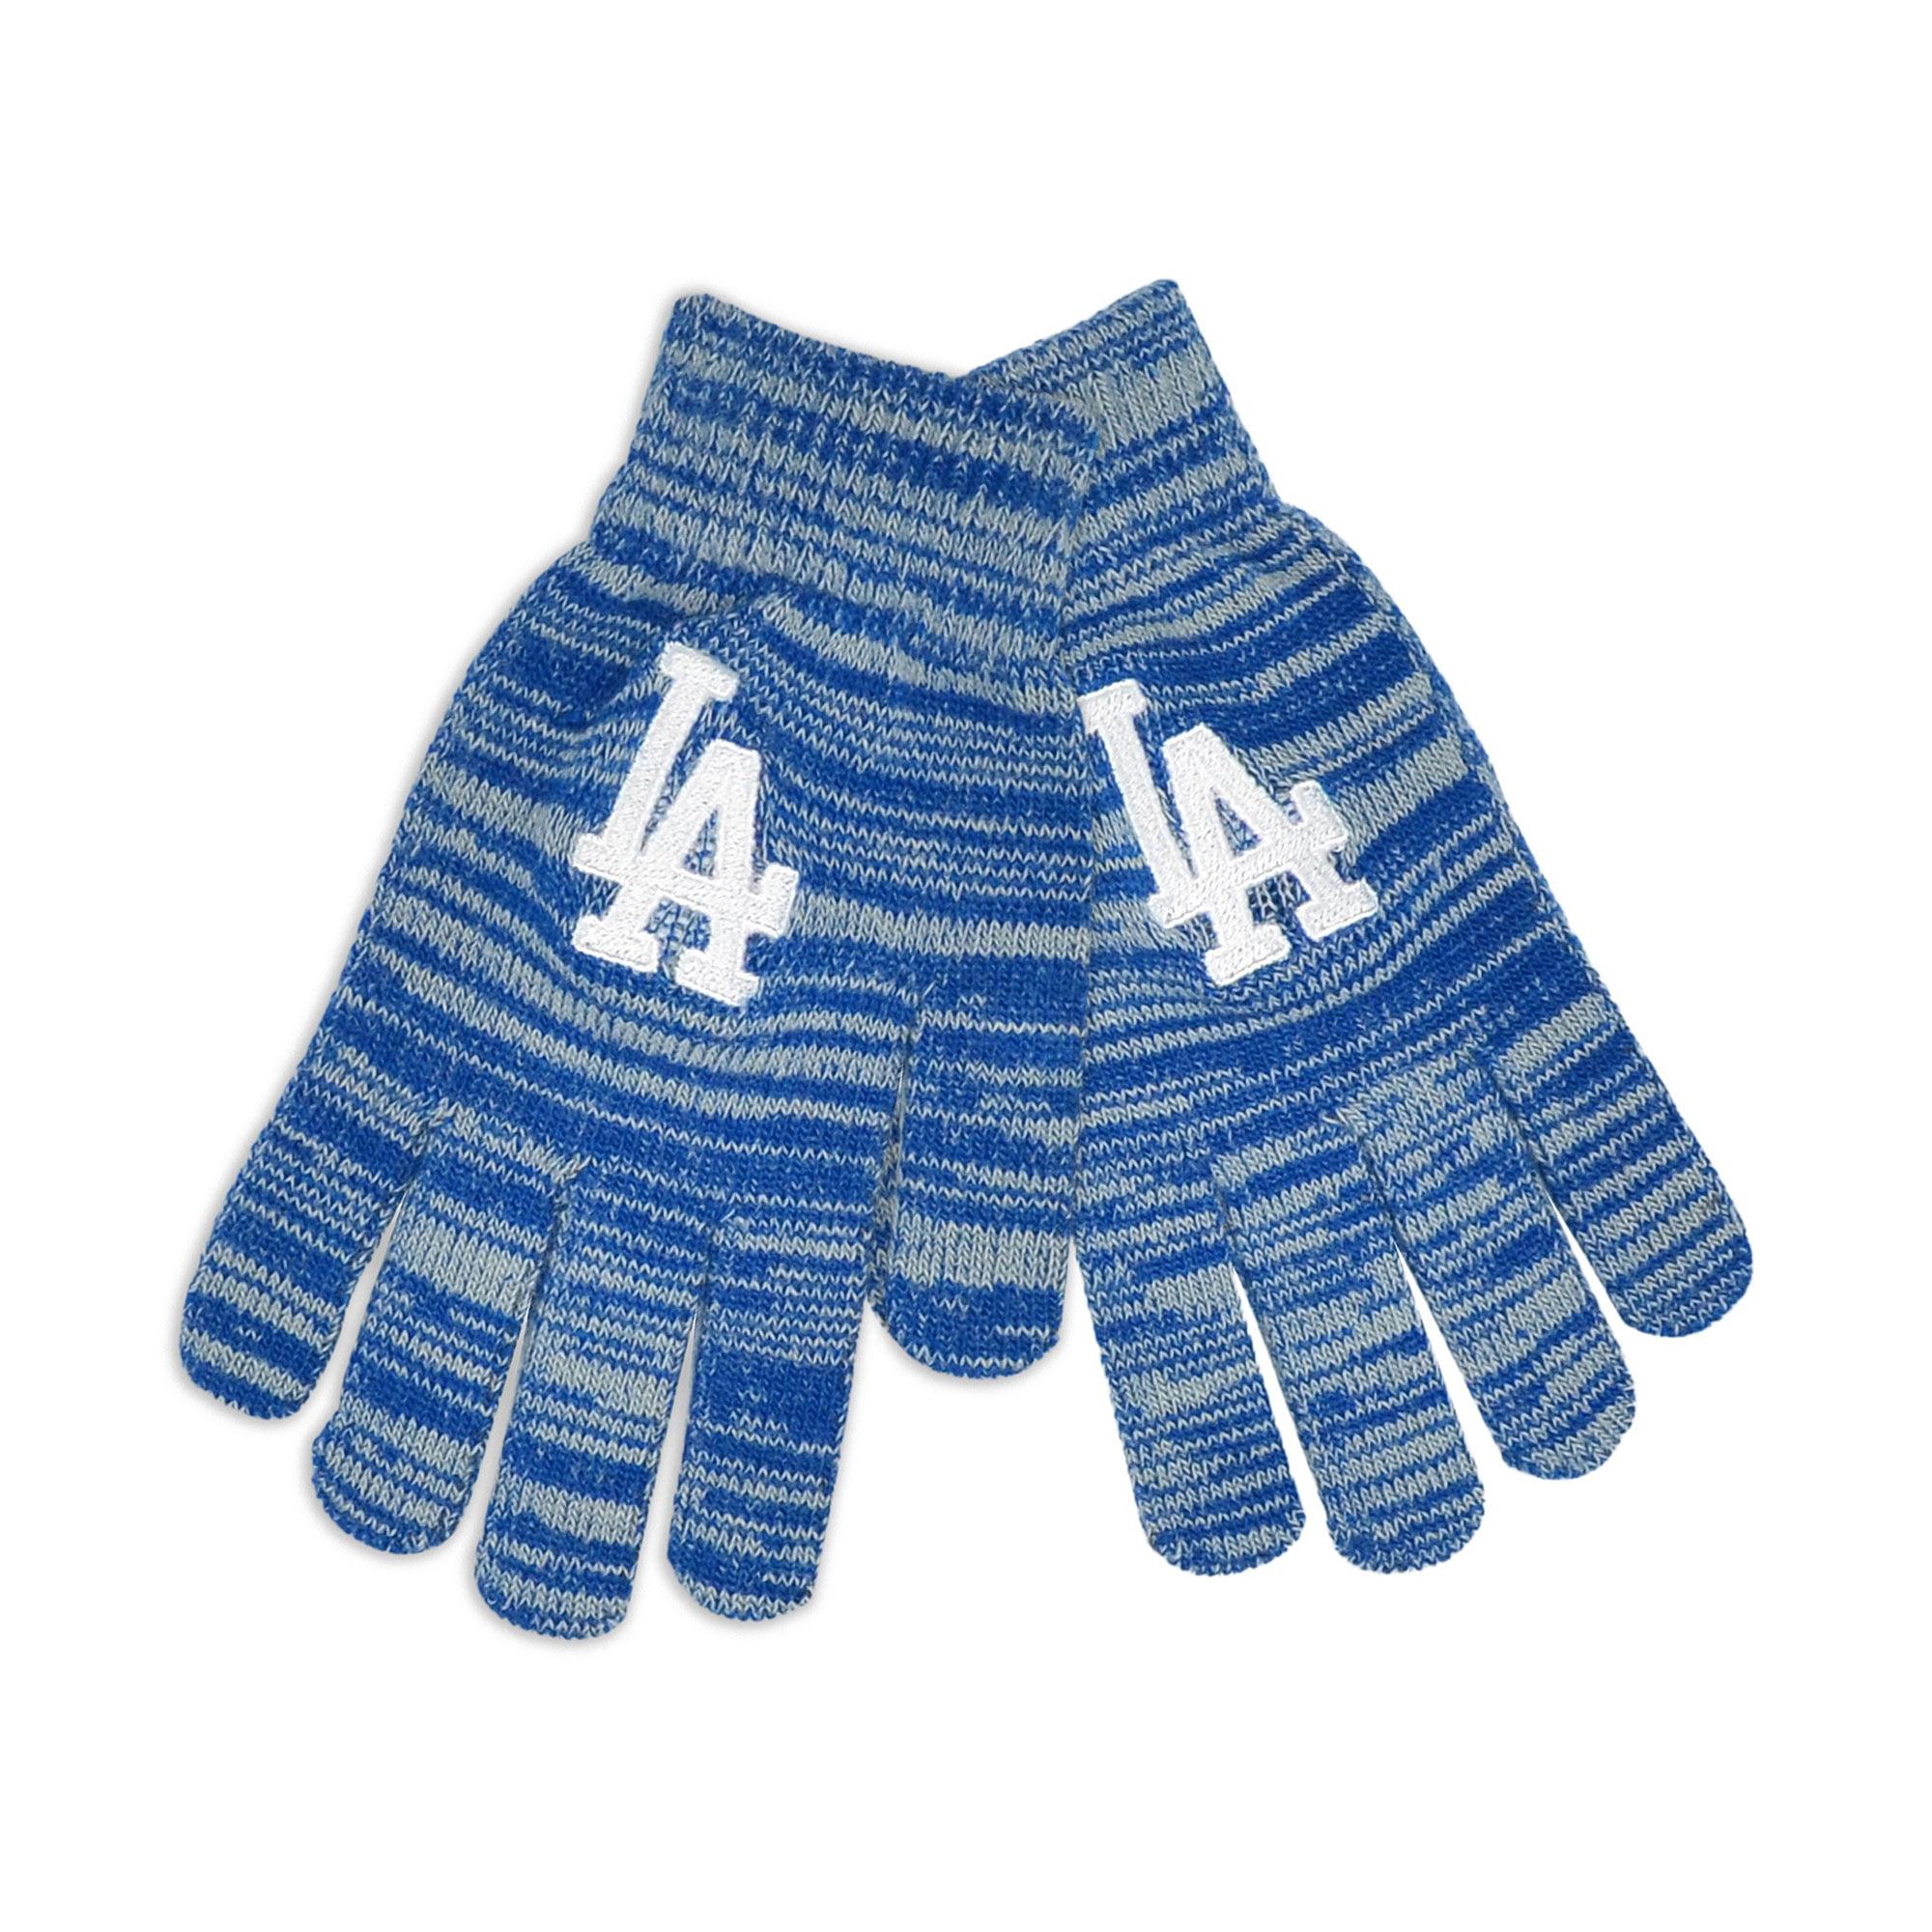 Los Angeles Dodgers Colorblend Gloves - No Size